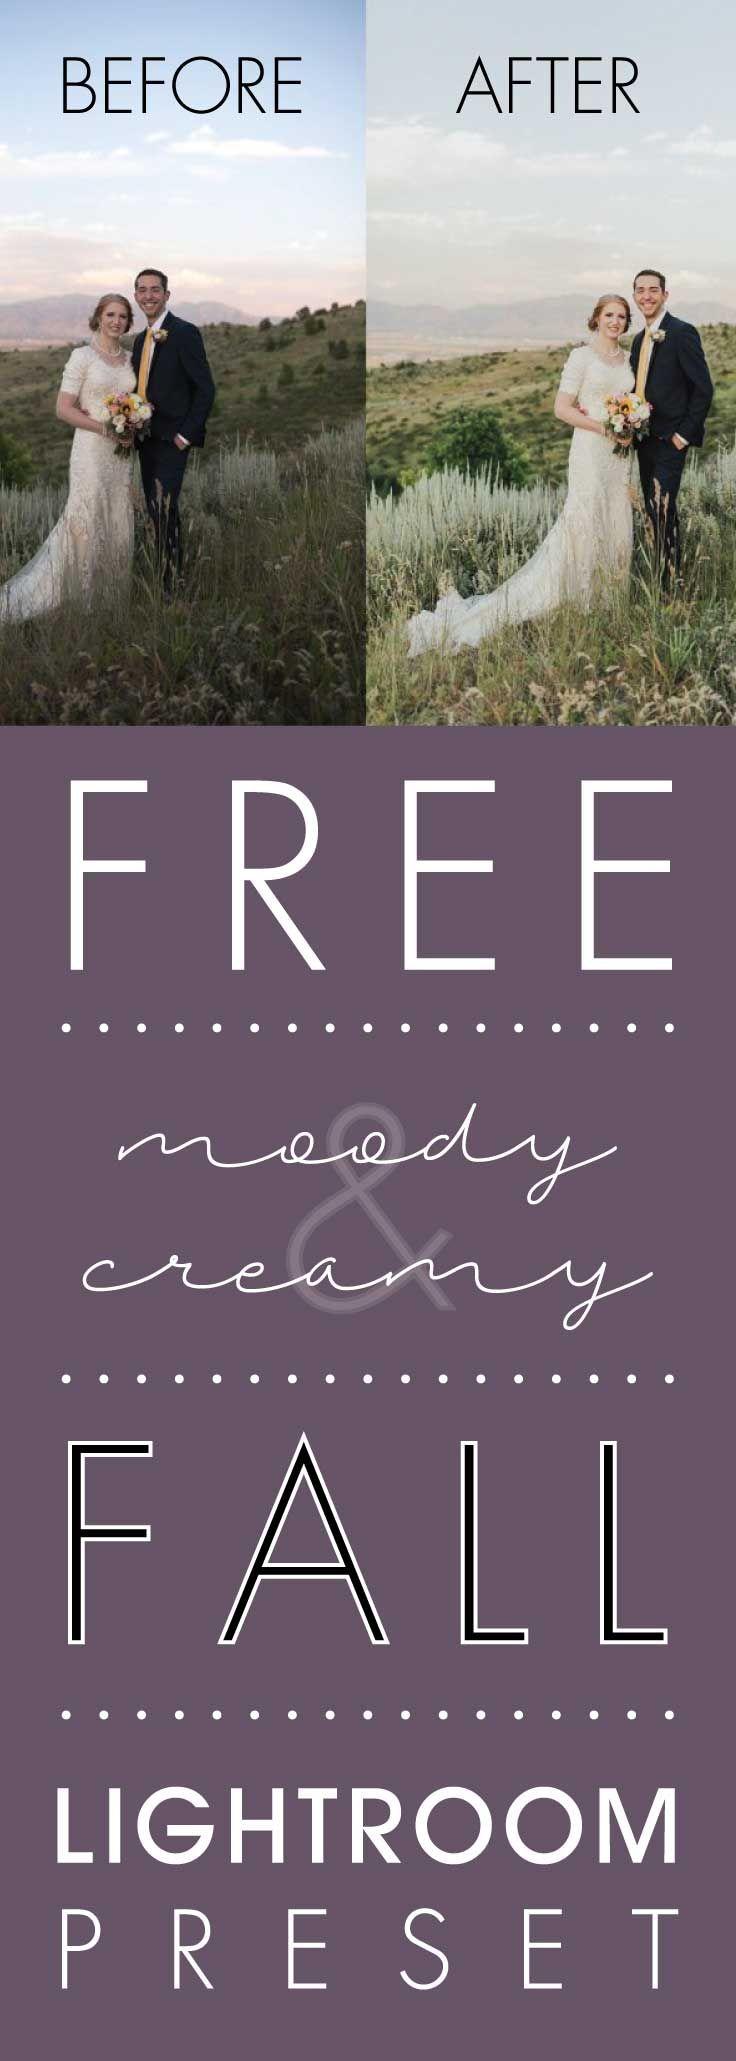 Free Moody and Creamy Fall Lightroom Preset